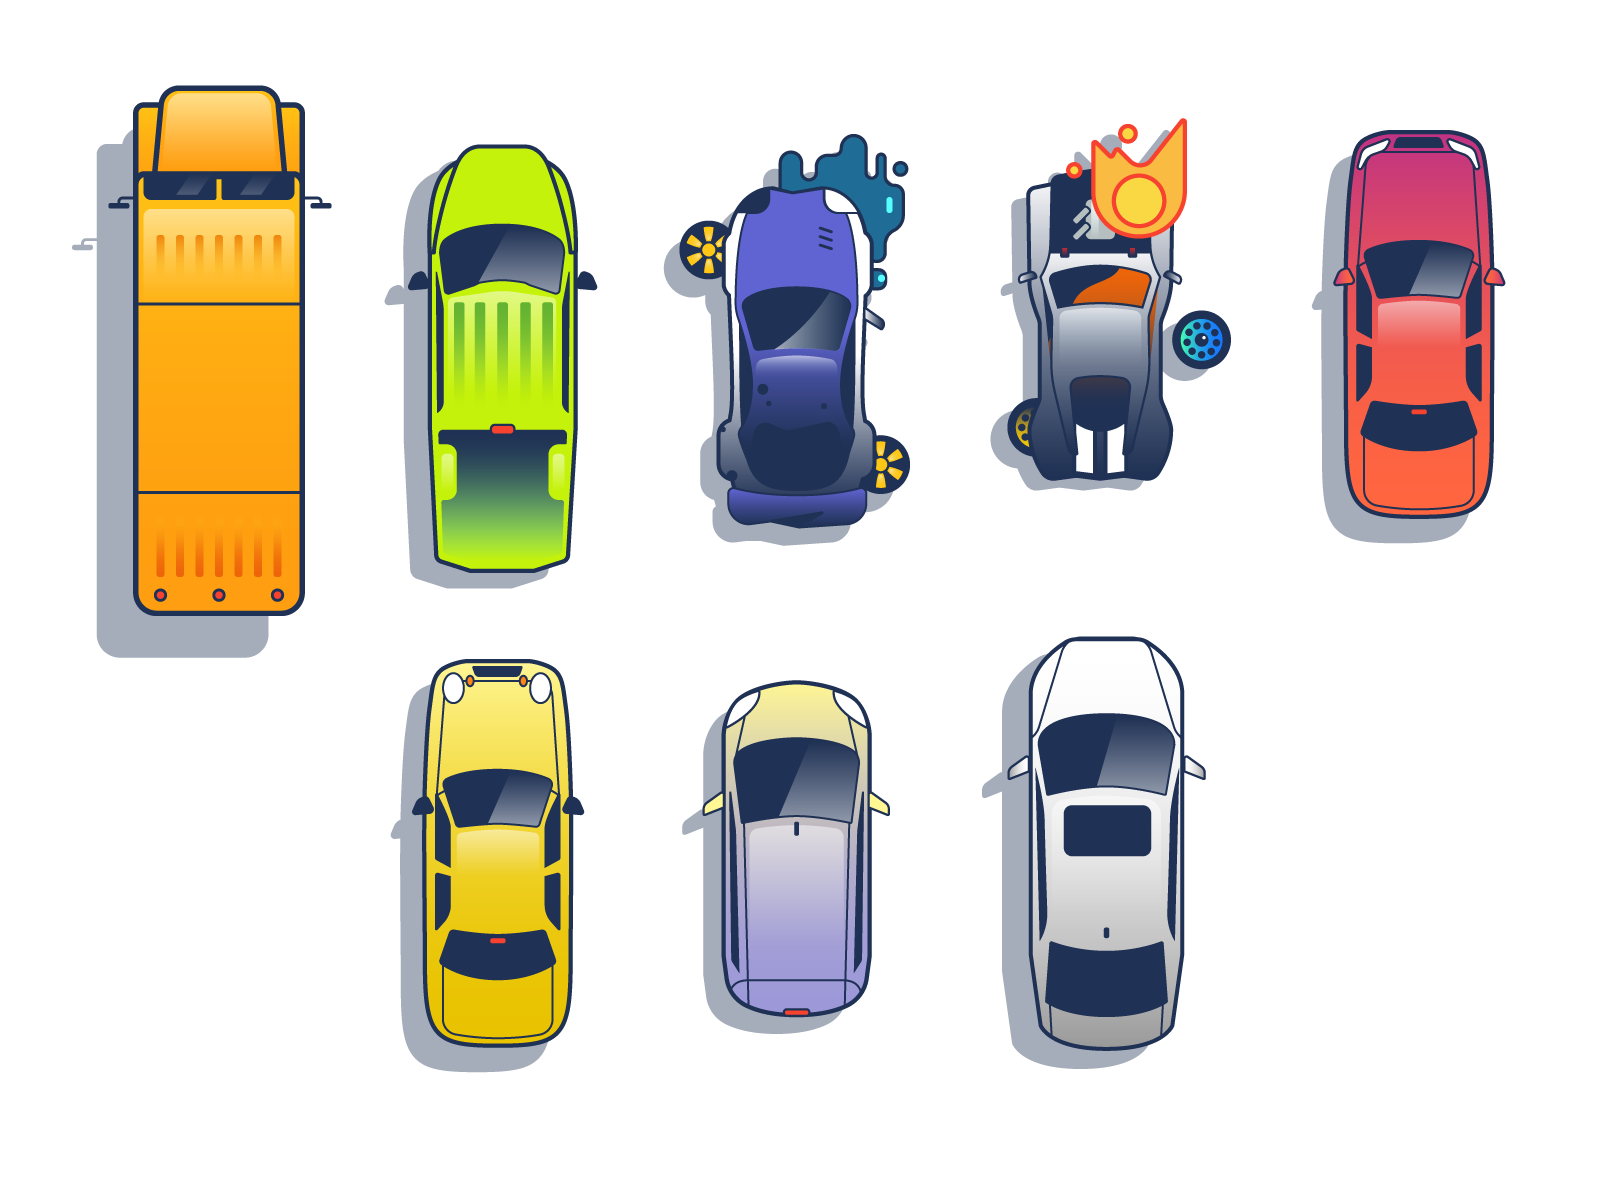 cars vehicles illustration graphic design